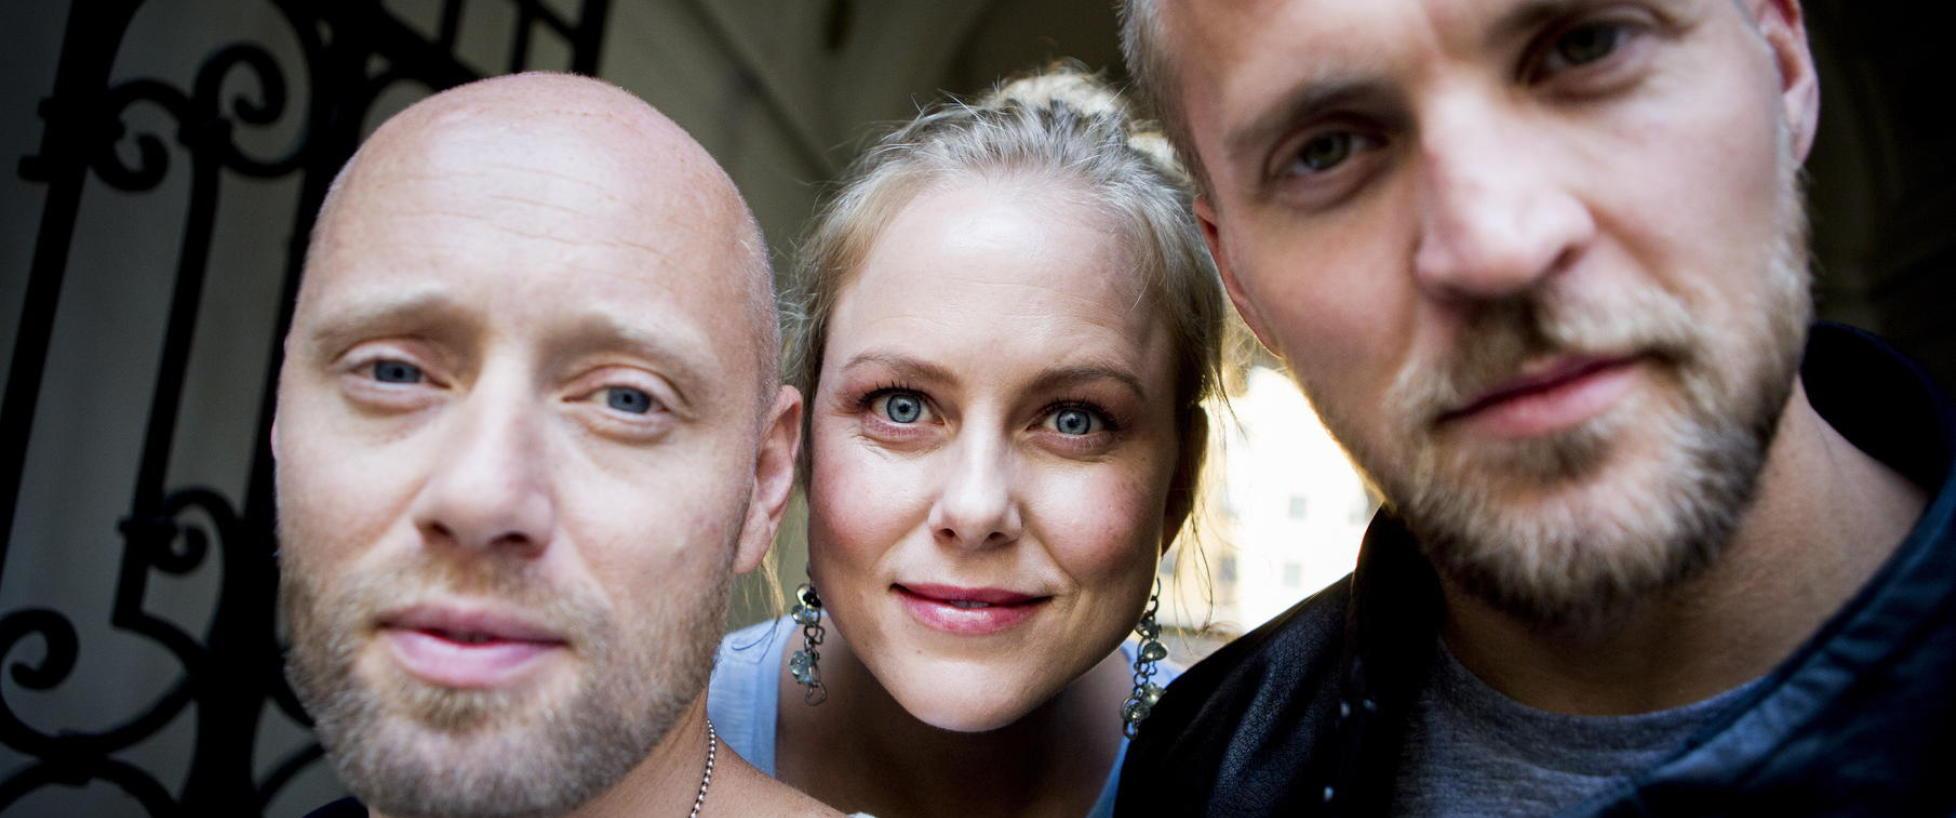 real escort videos norske damer nakne